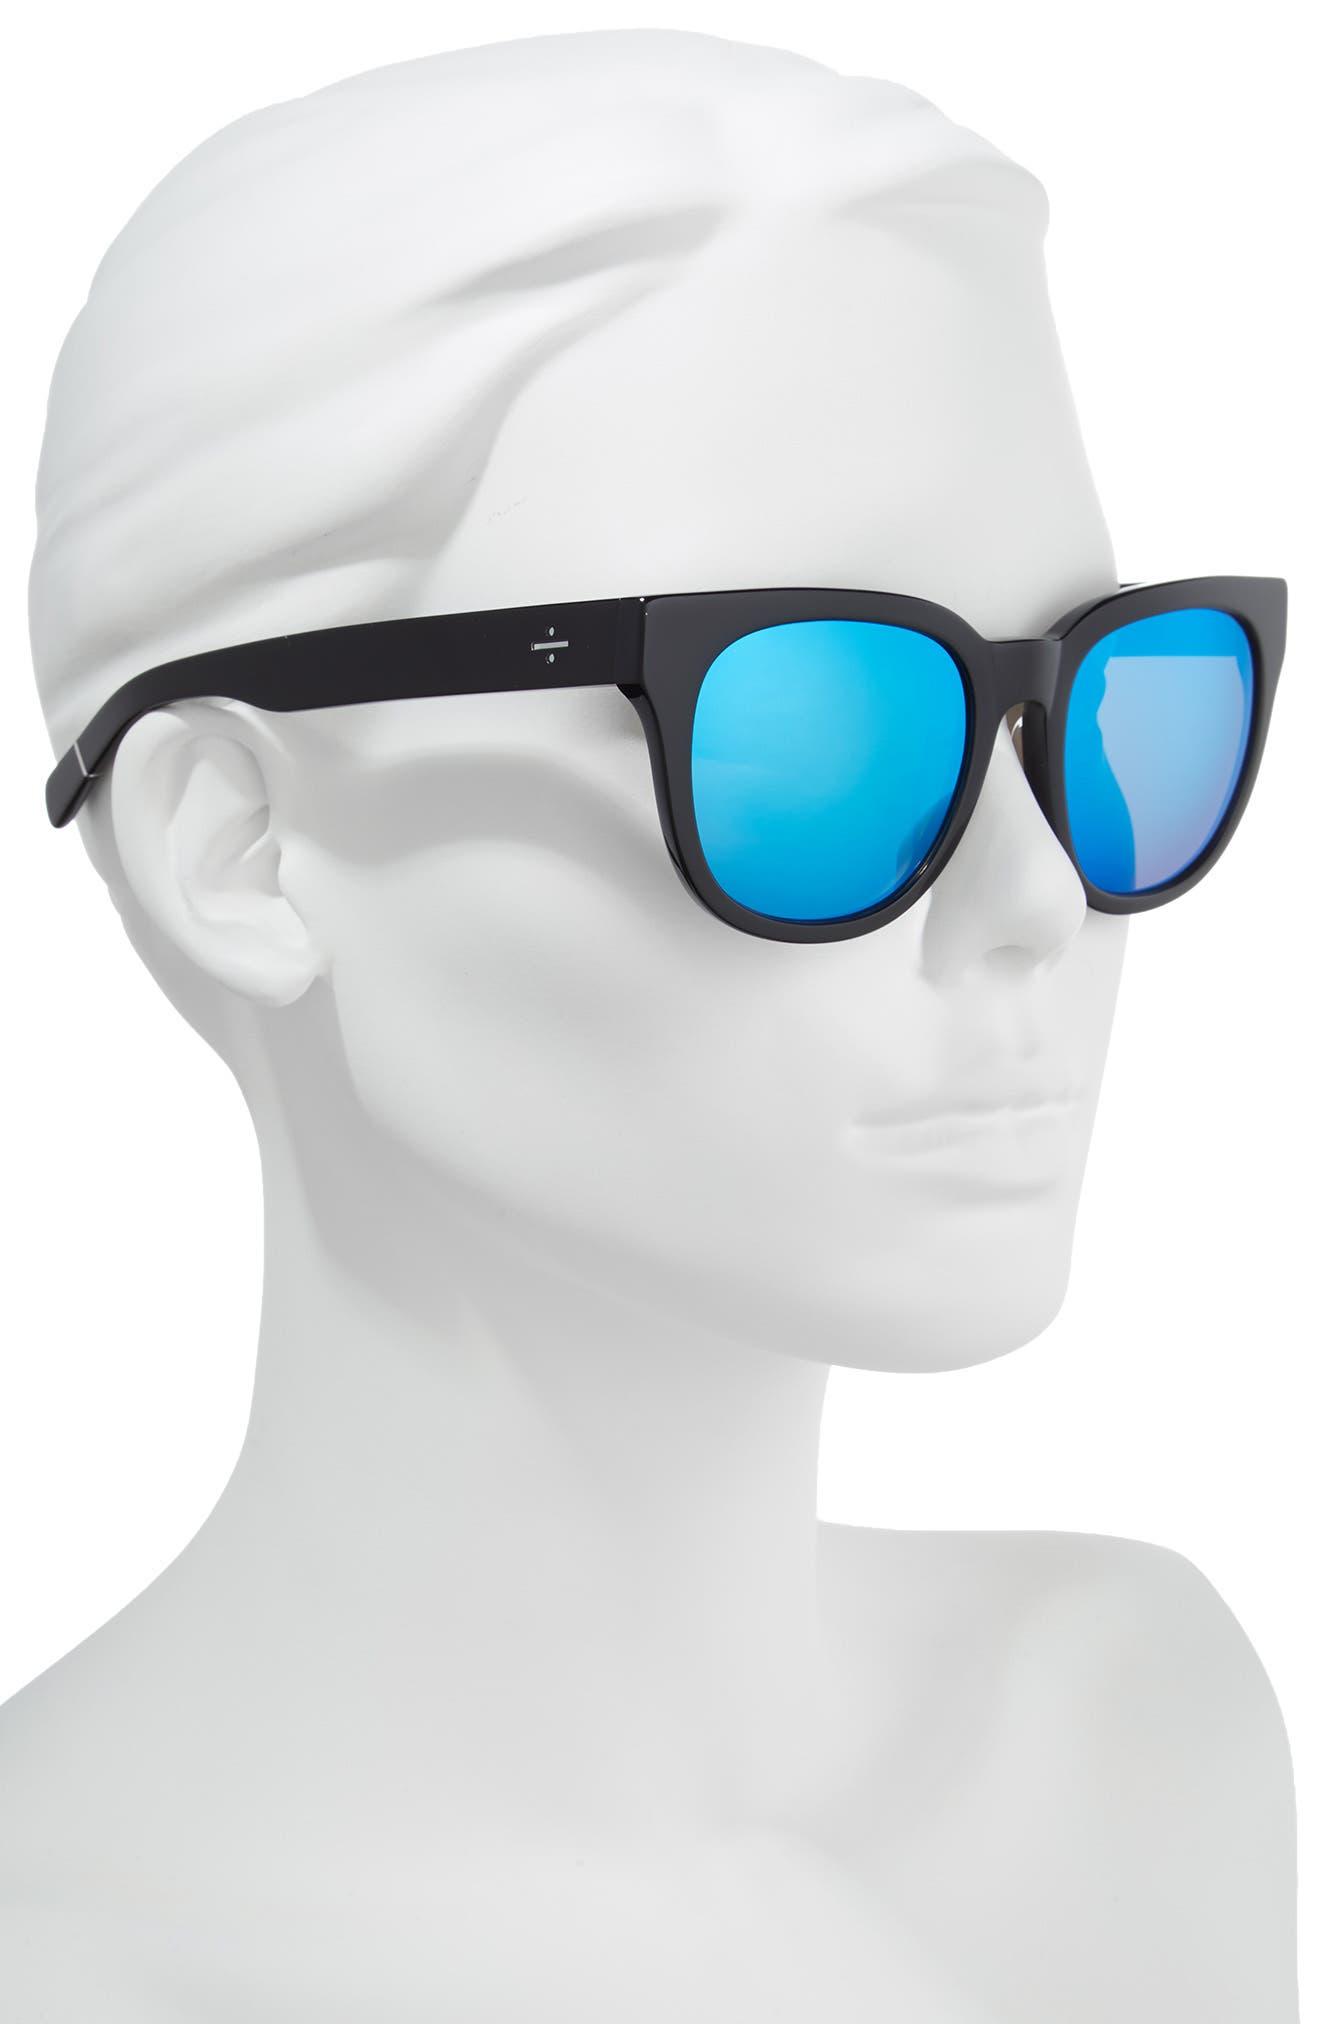 BLANC & ECLARE Seoul 55mm Polarized Sunglasses,                             Alternate thumbnail 2, color,                             002